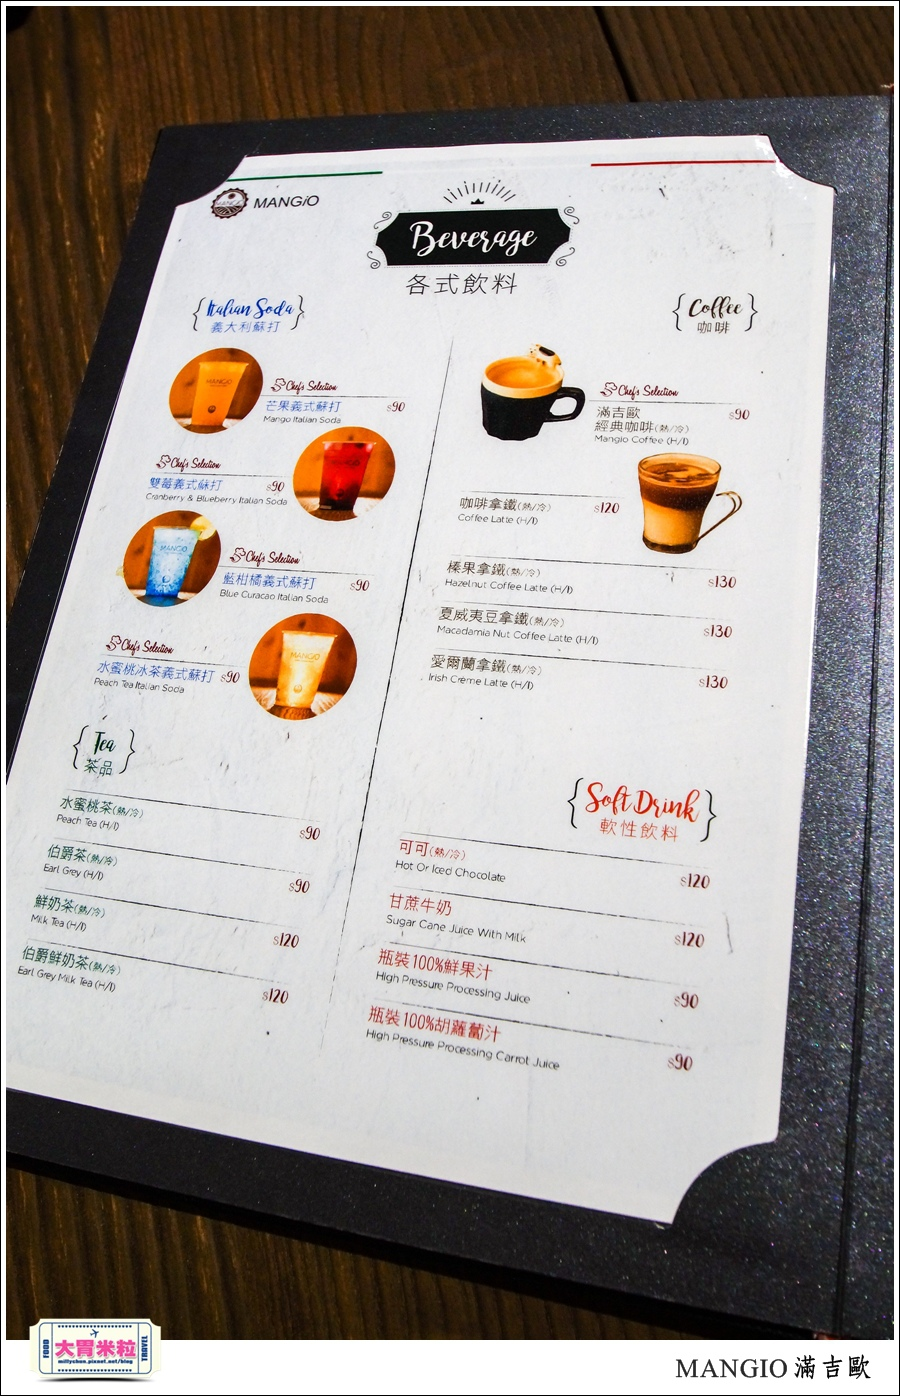 MANGiO Bistro 滿吉歐義式樂活餐酒館@台北餐酒館推薦@大胃米粒0065.jpg